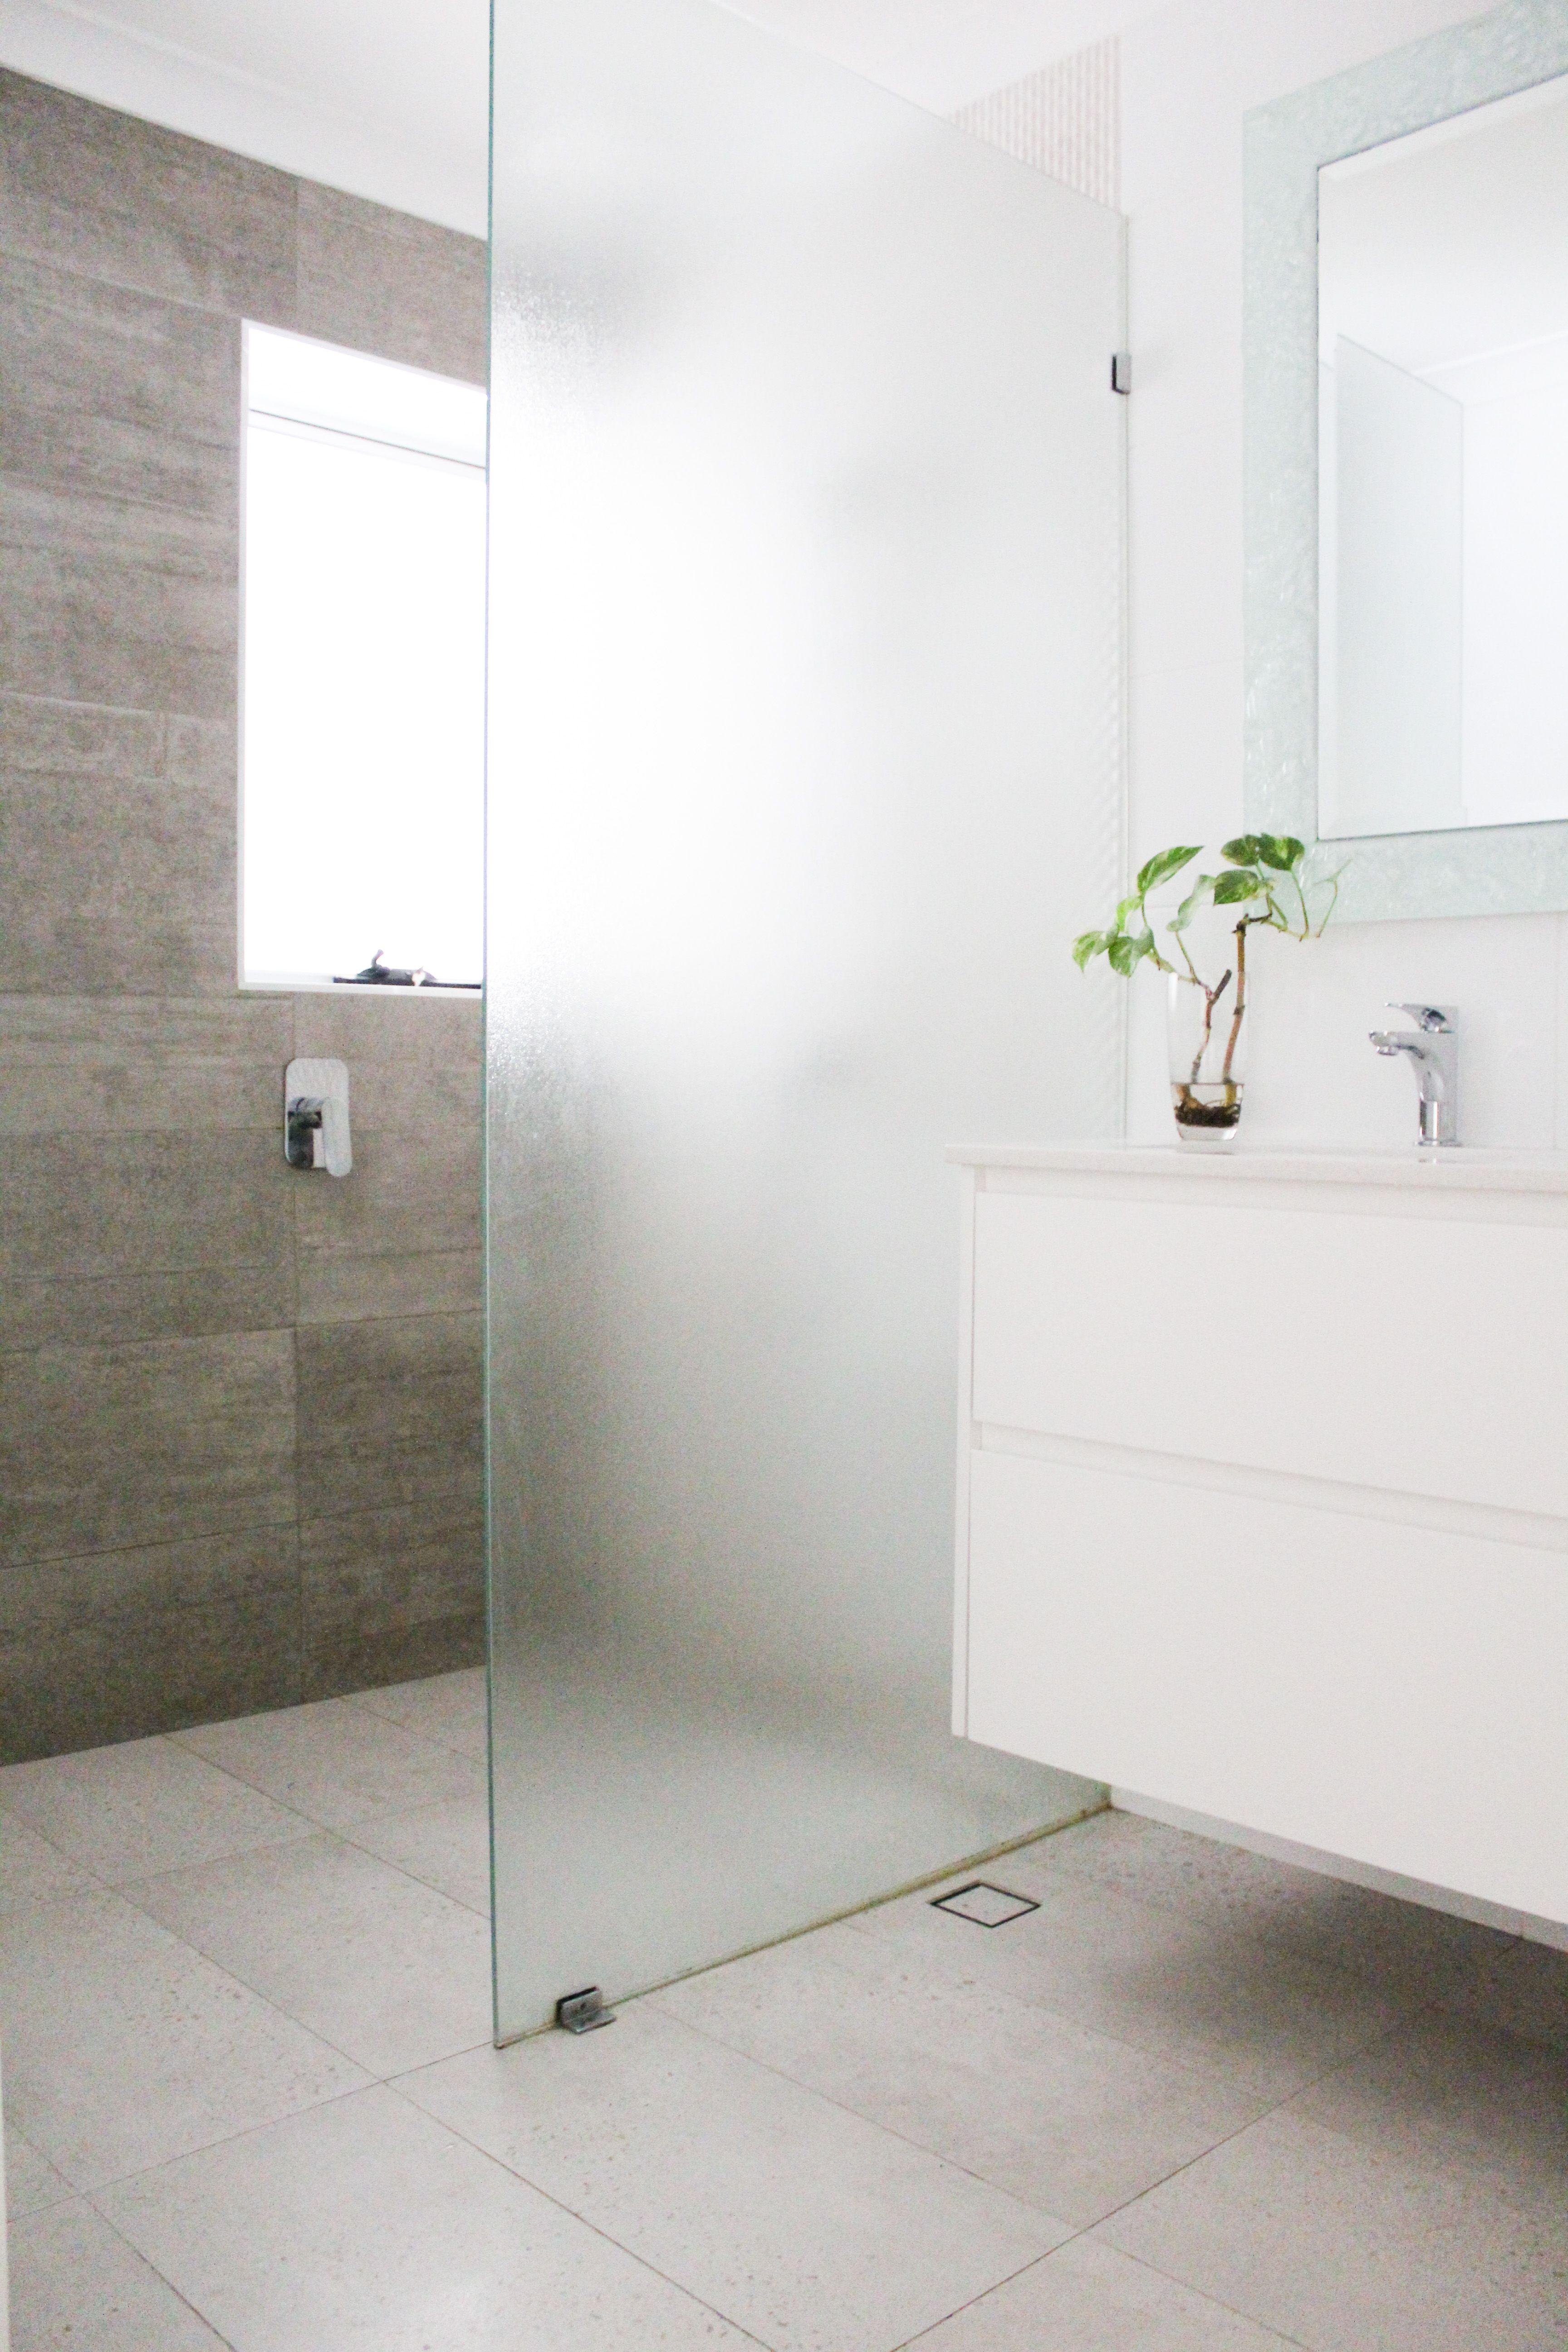 Frameless Shower Bathroom Renovation Trends Wet Room Screens Bathroom Trends